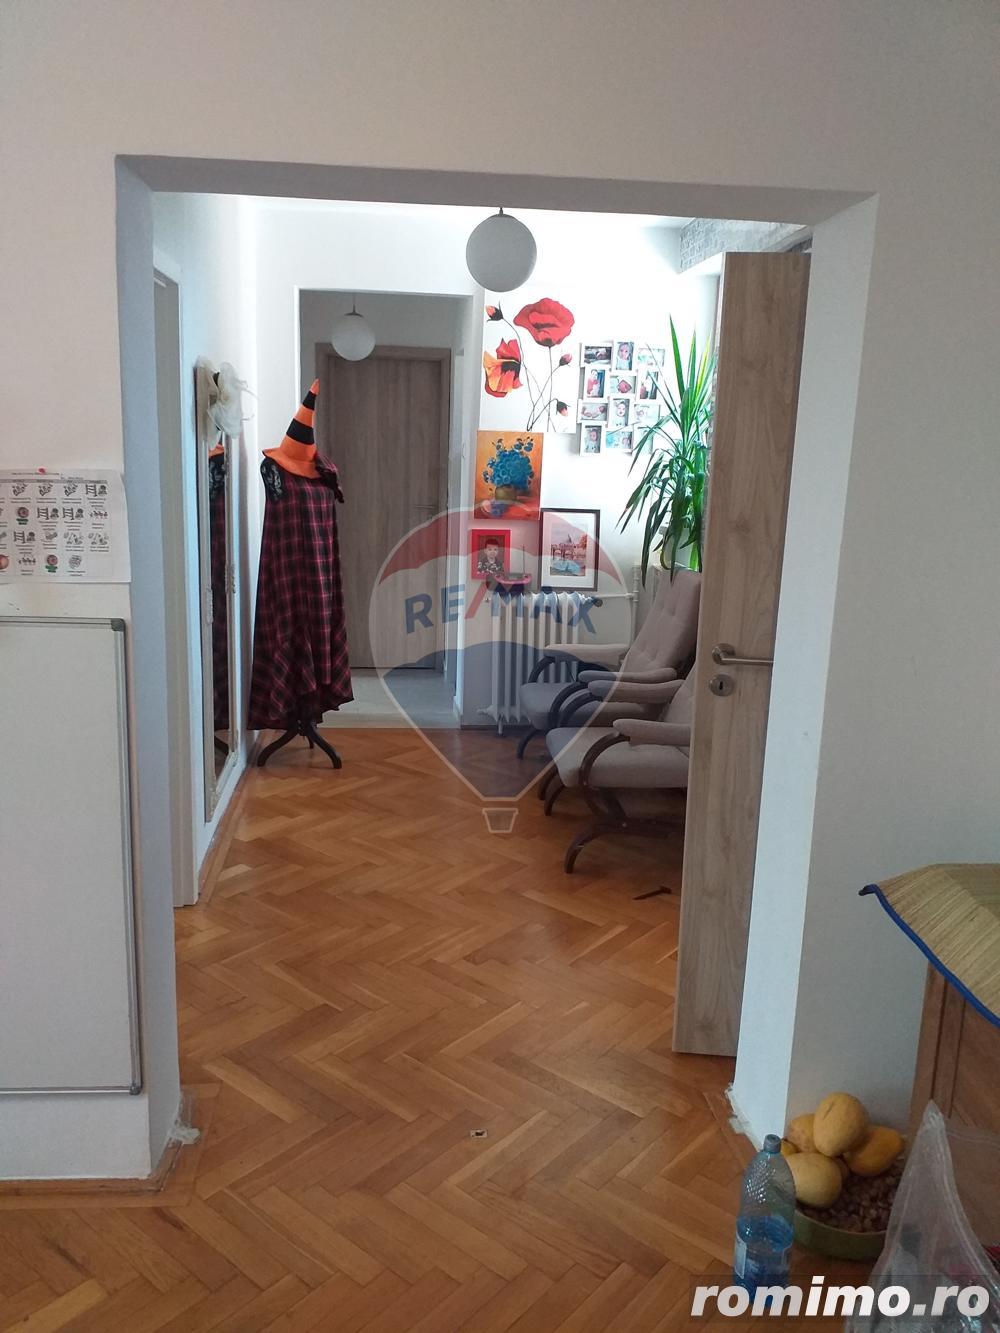 Apartament de vanzare cu 3 camere pe str. Transilvaniei Rogerius